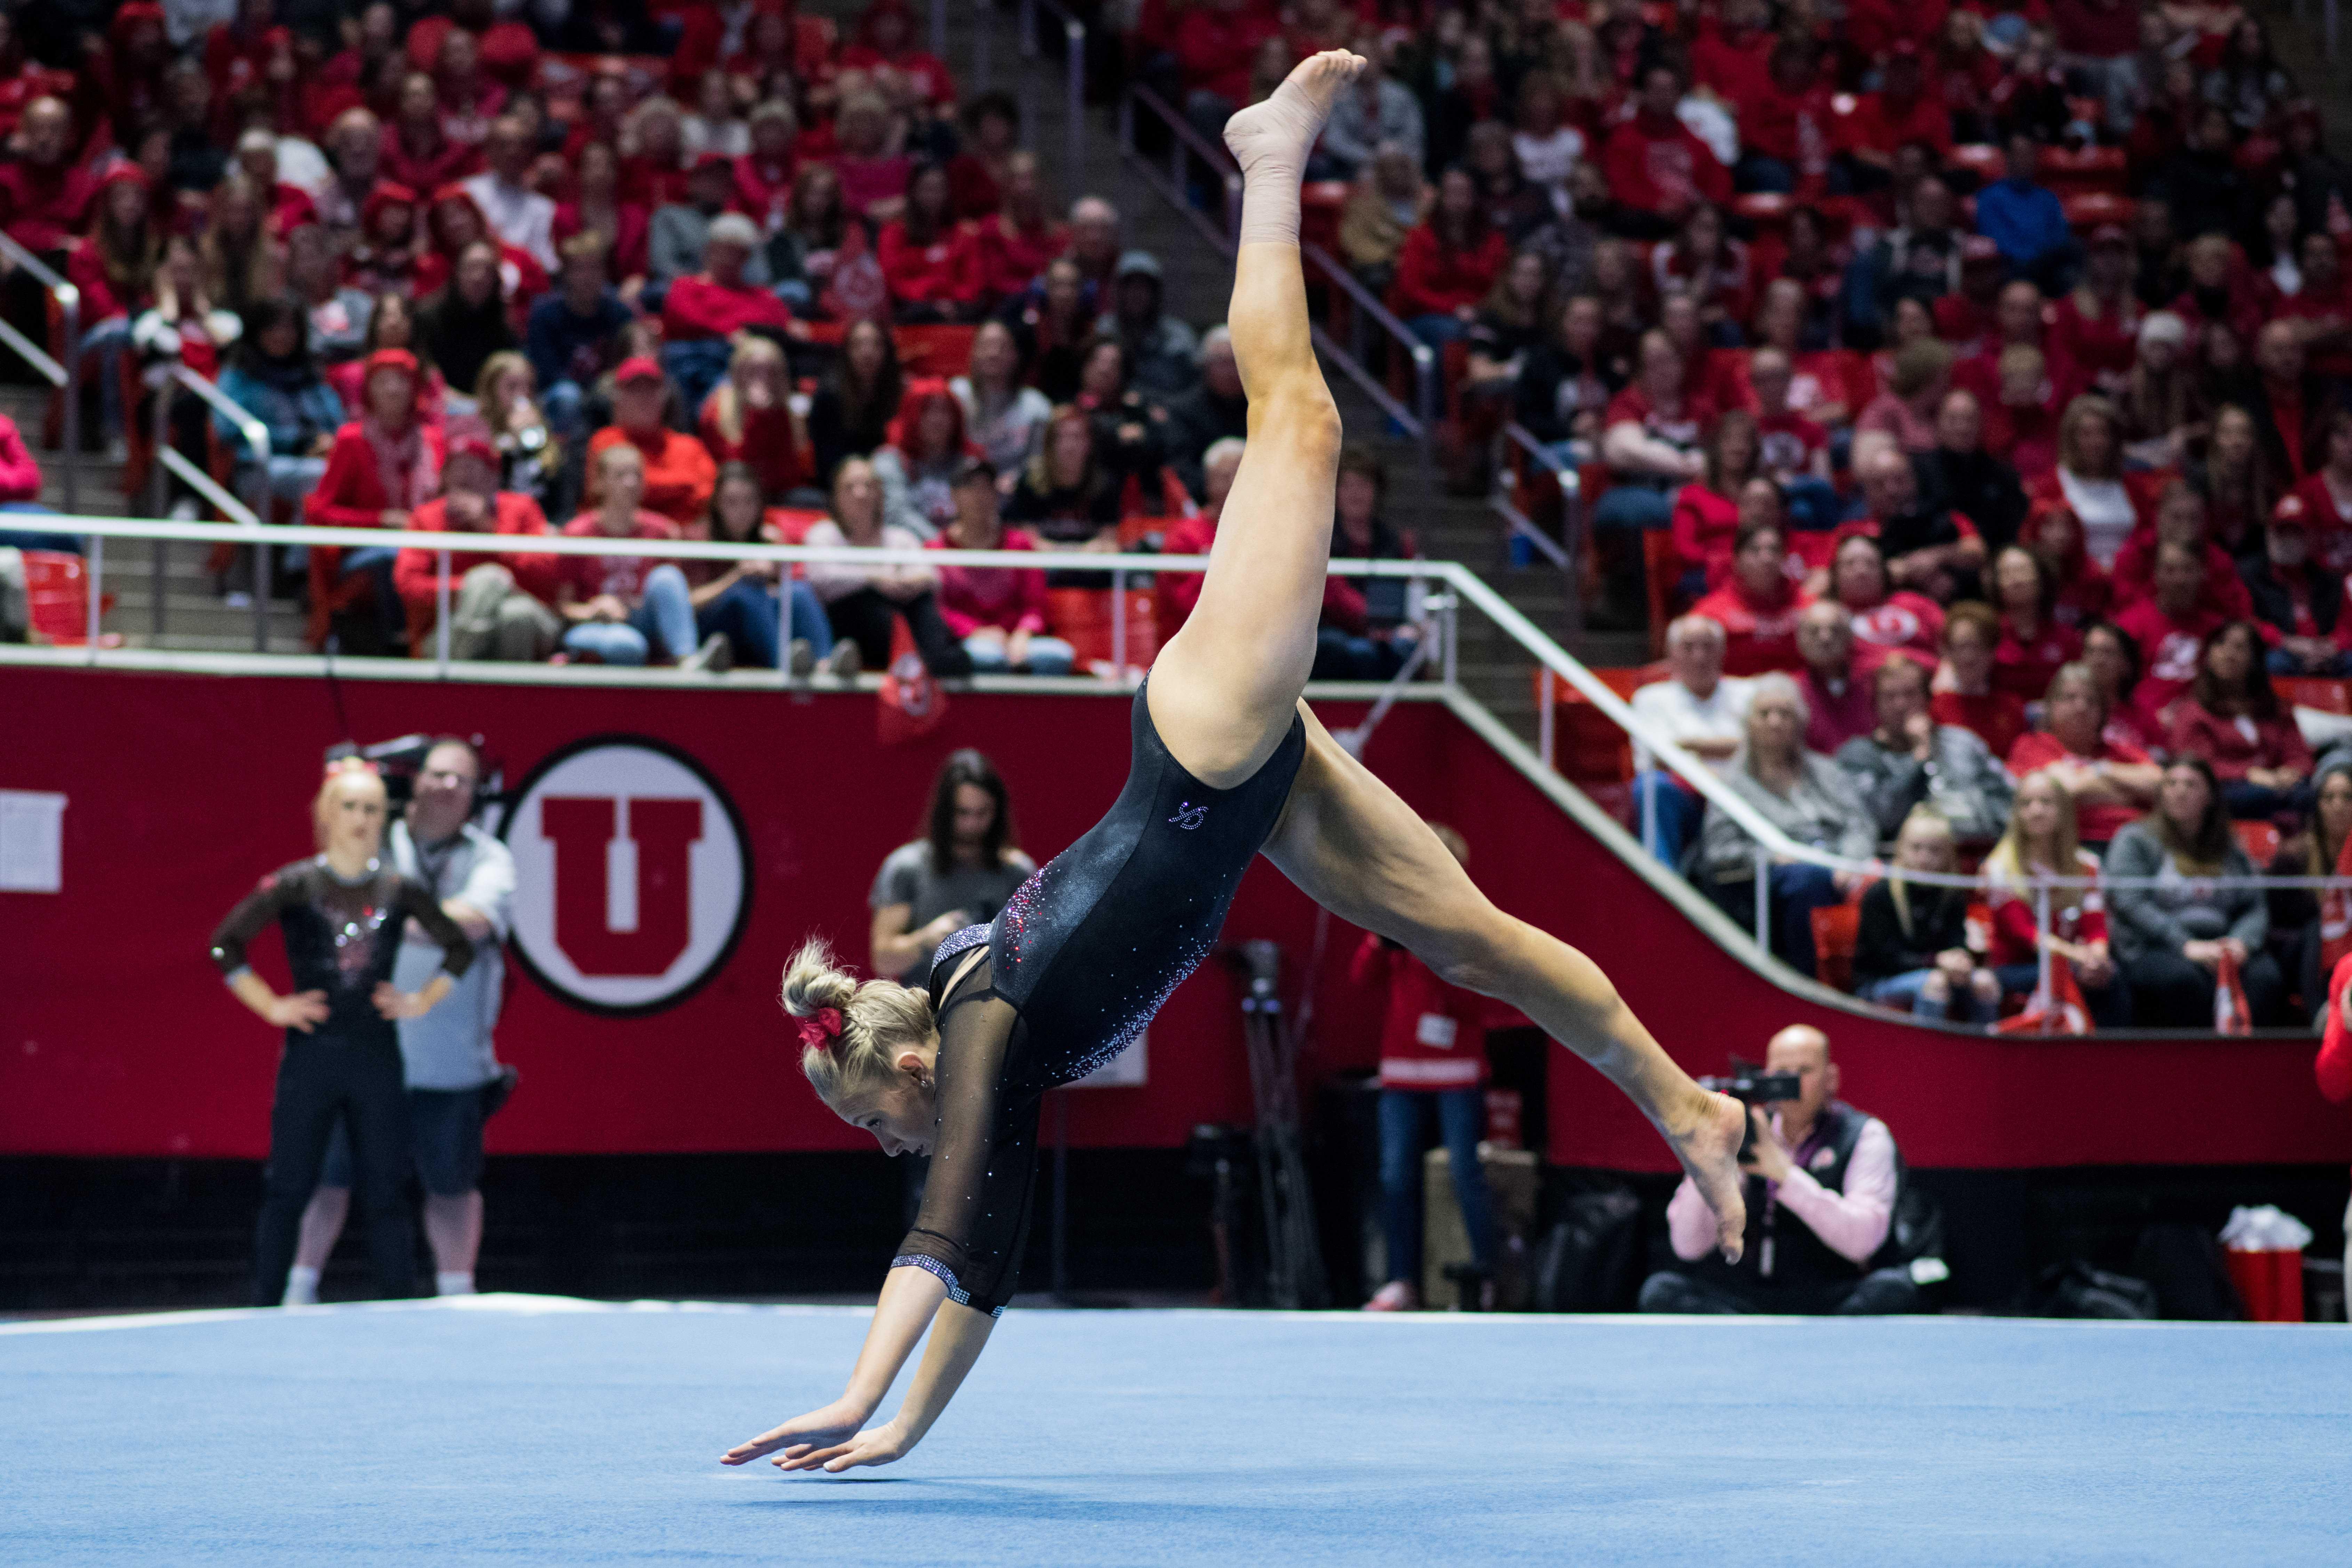 University of Utah senior Makenna Merrell-Giles performs her floor routine in an NCAA Women's Gymnastics meet vs. UCLA at Jon M. Huntsman Center in Salt Lake City, UT on Saturday February 23, 2019.  (Photo by Curtis Lin   The Daily Utah Chronicle)